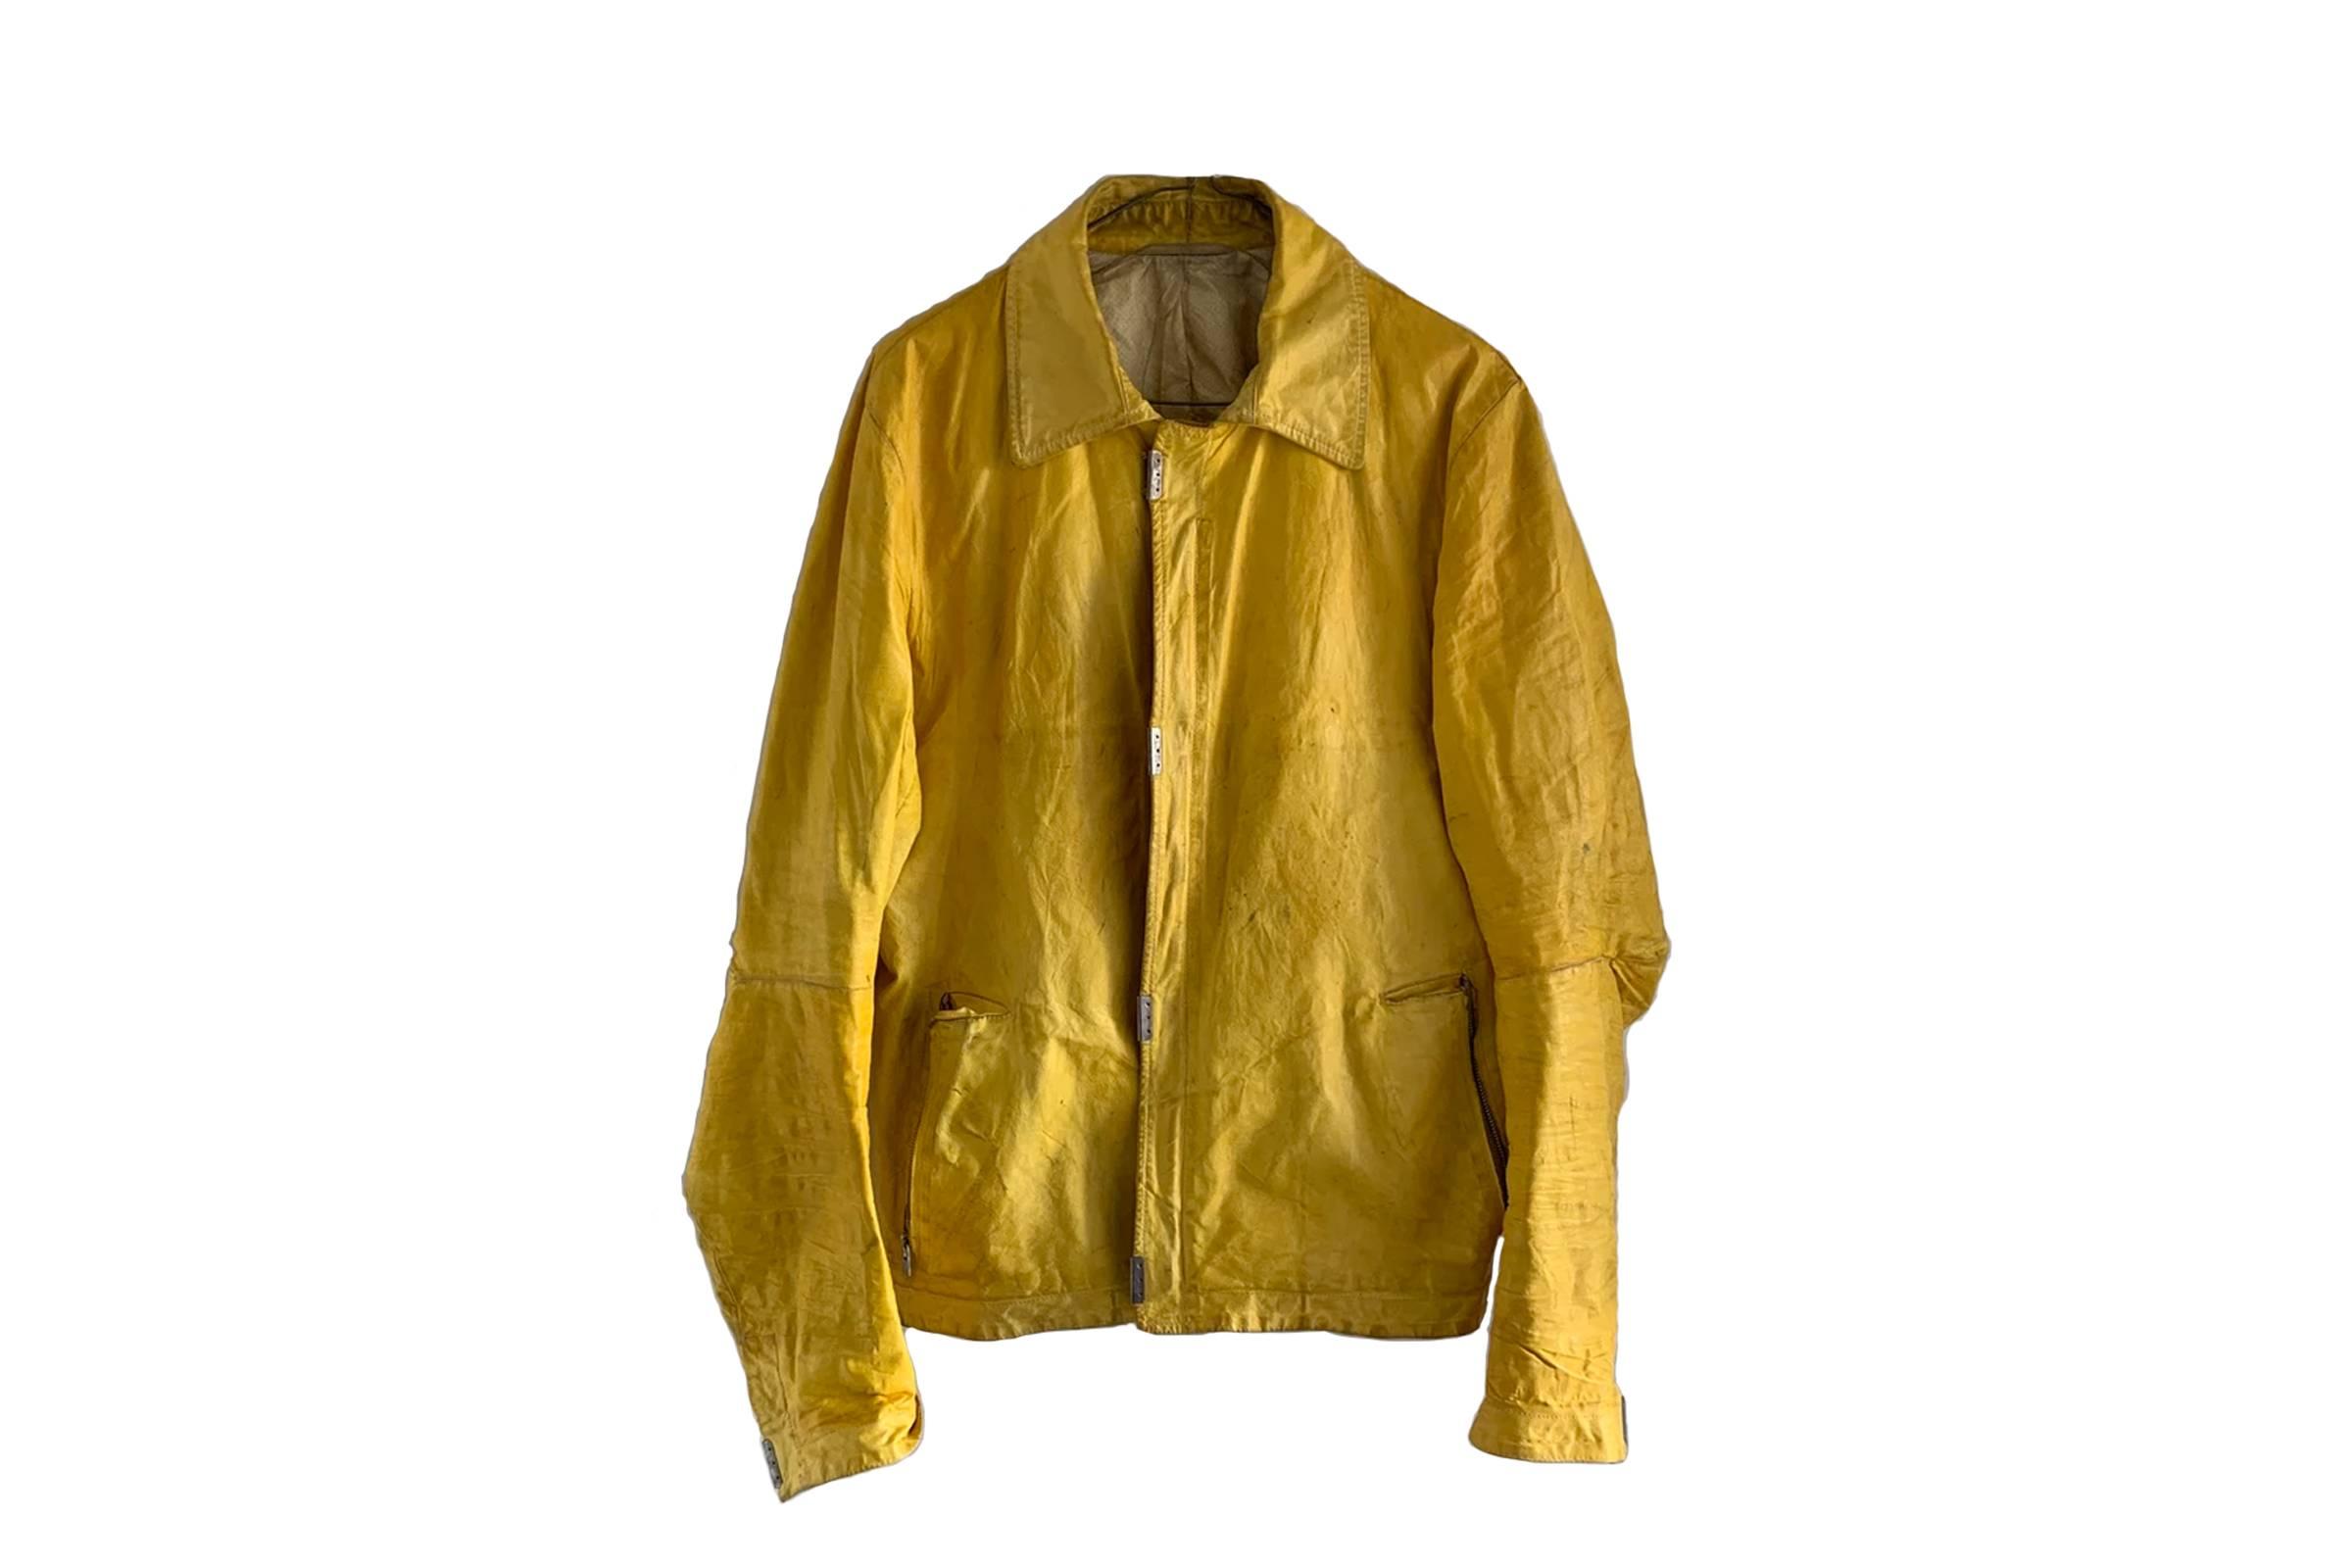 Carol Christian Poell Scarstich Leather Jacket